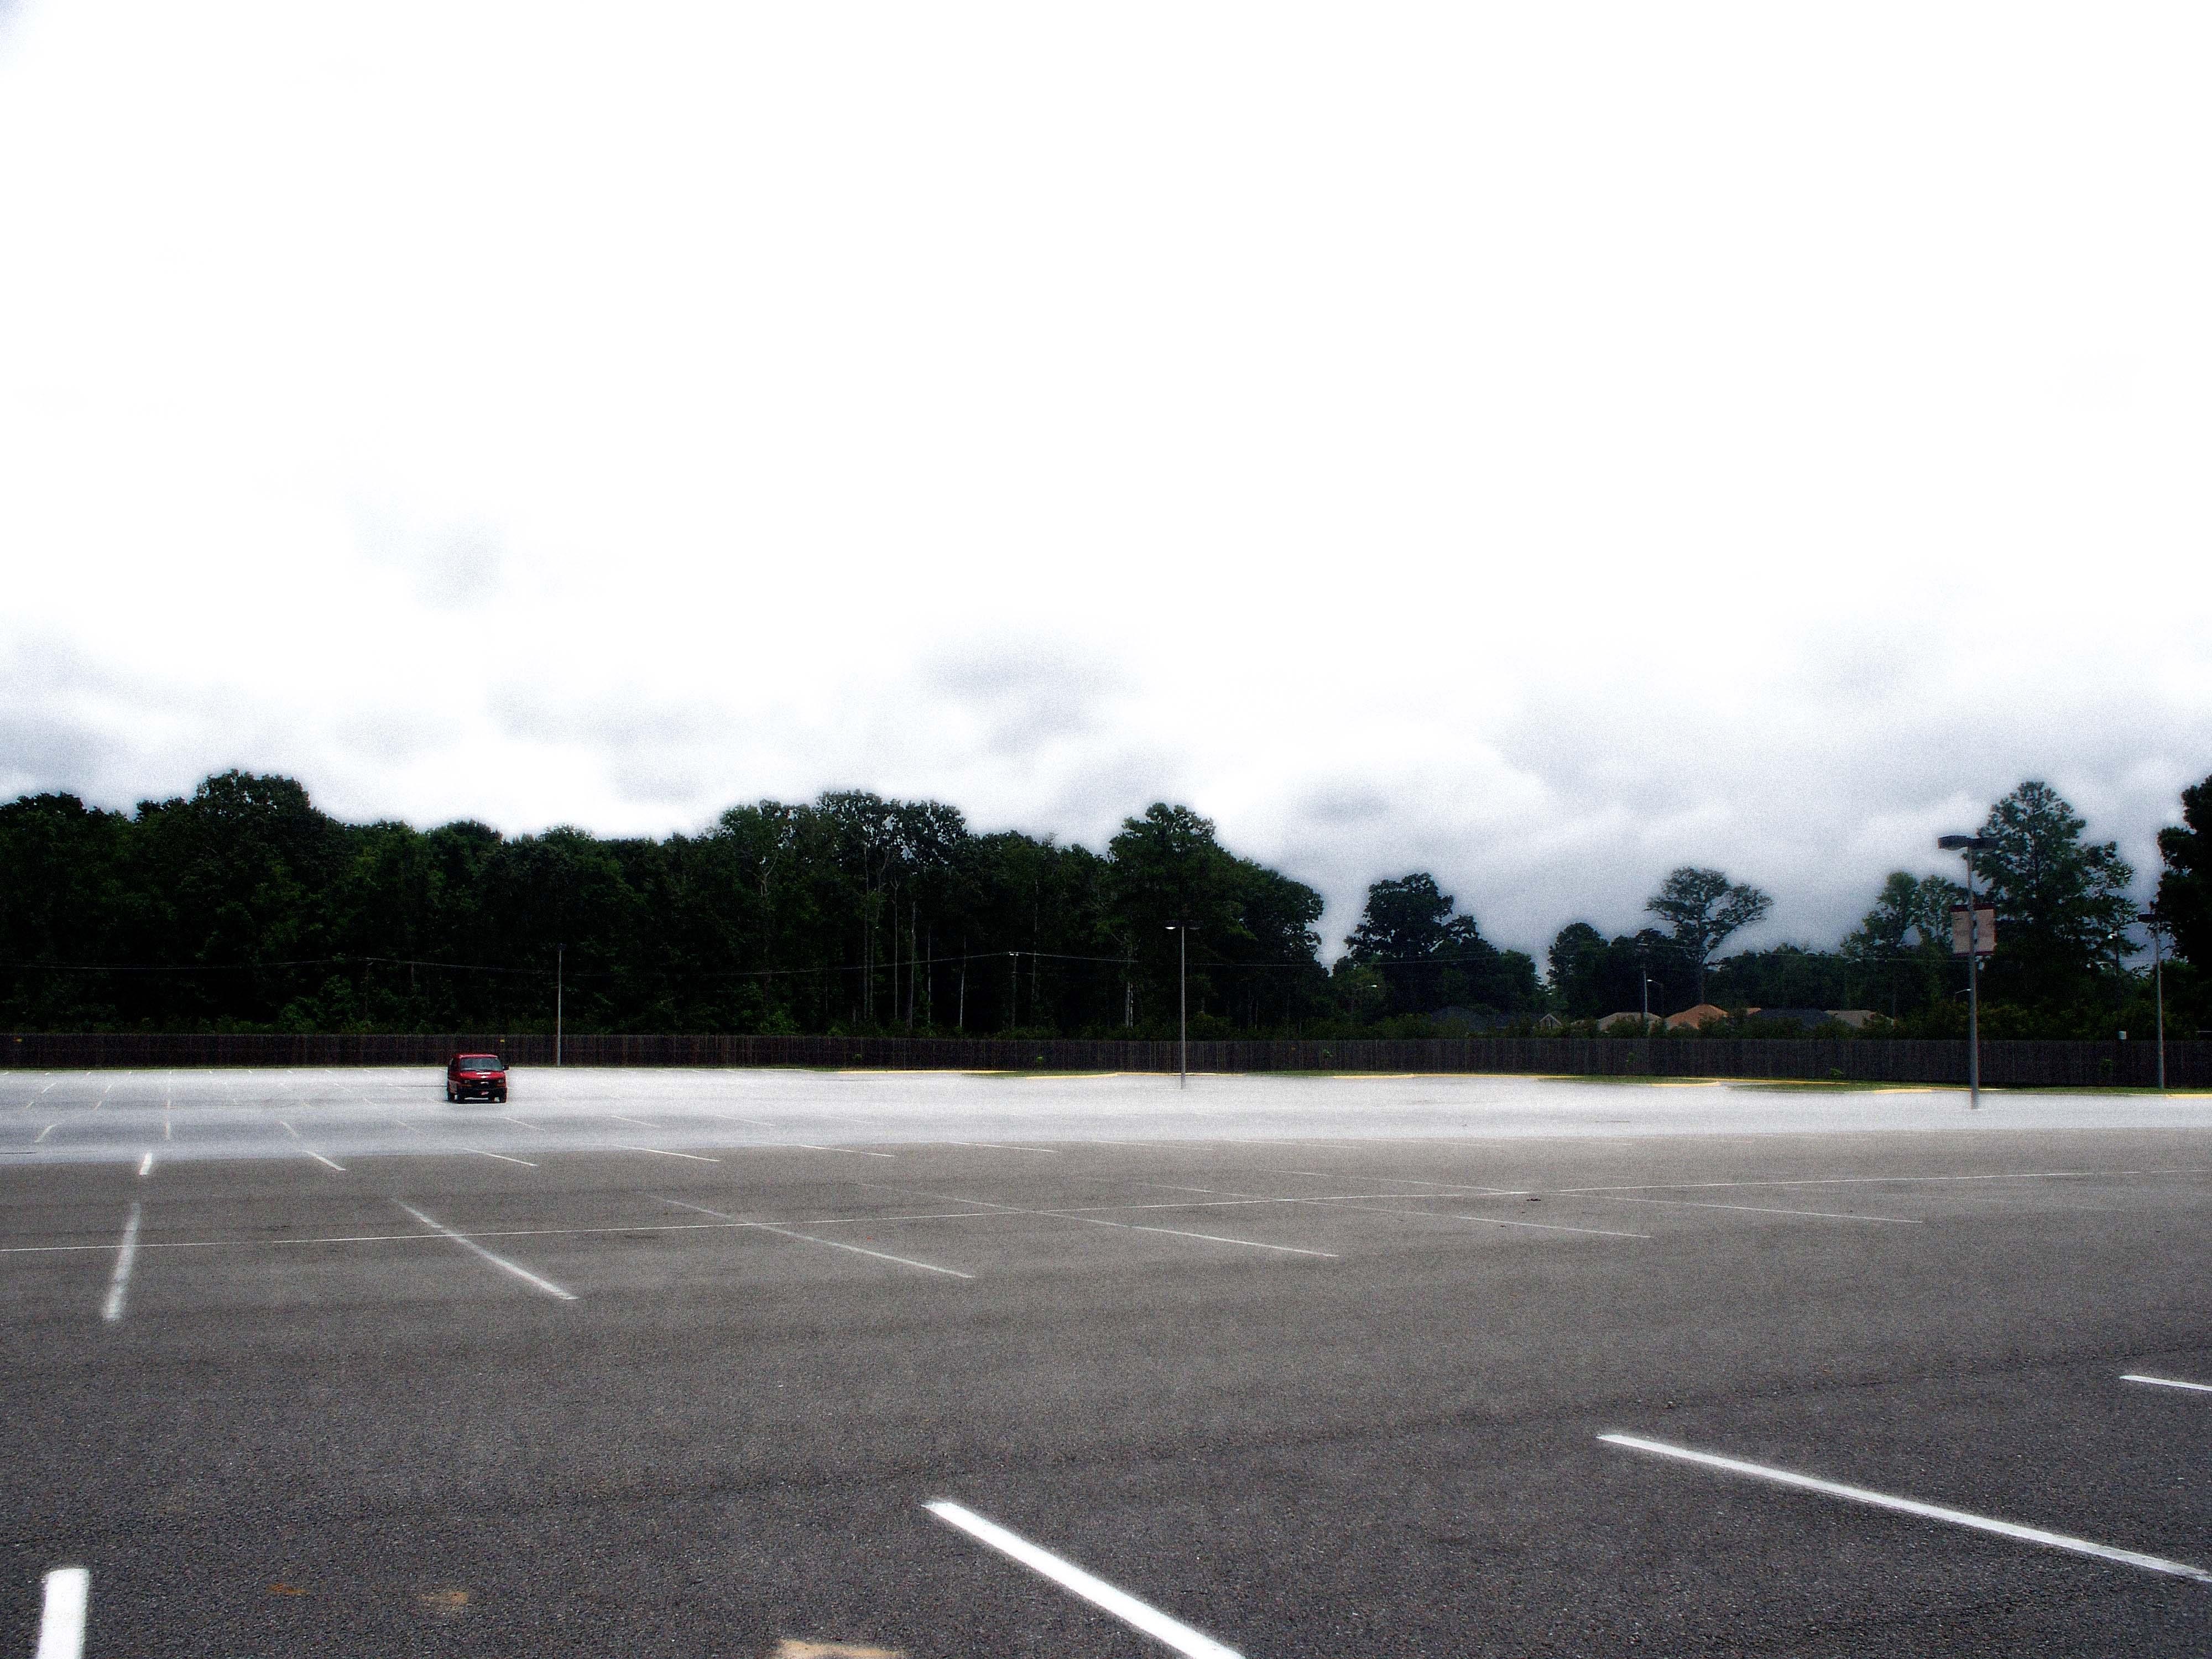 File:Parkinglot empty.jpg - Wikimedia Commons